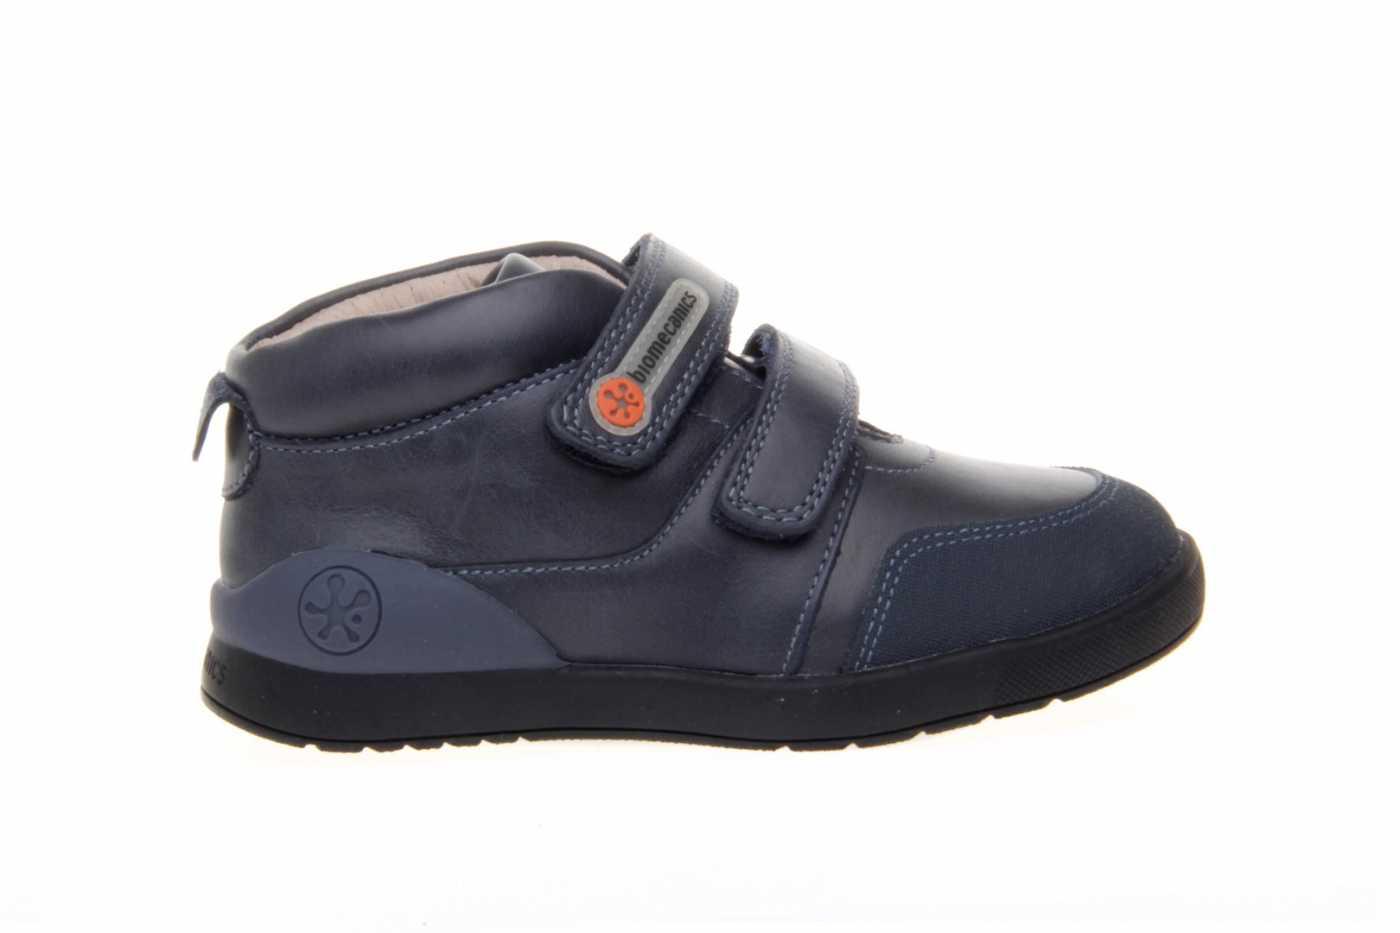 3f1d462b677 Comprar BOTA PIEL NIÑO AZUL JOVEN estilo BOTAS zapato tipo COLOR rzZwqUr